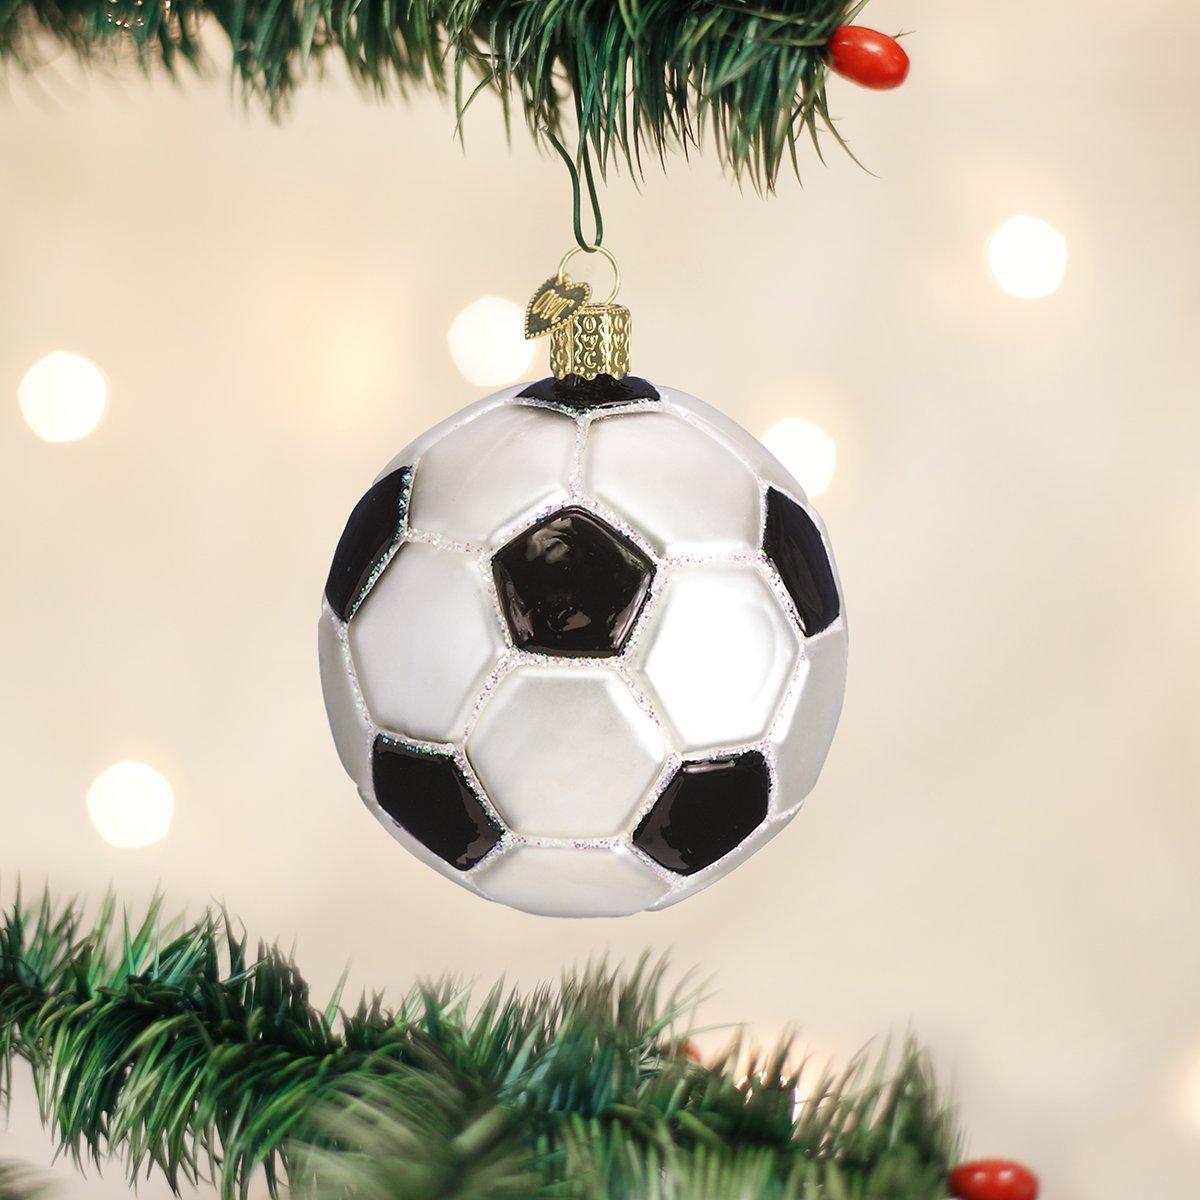 Soccer ornaments - Amazon Com Old World Christmas Soccer Ball Glass Blown Ornament Home Kitchen